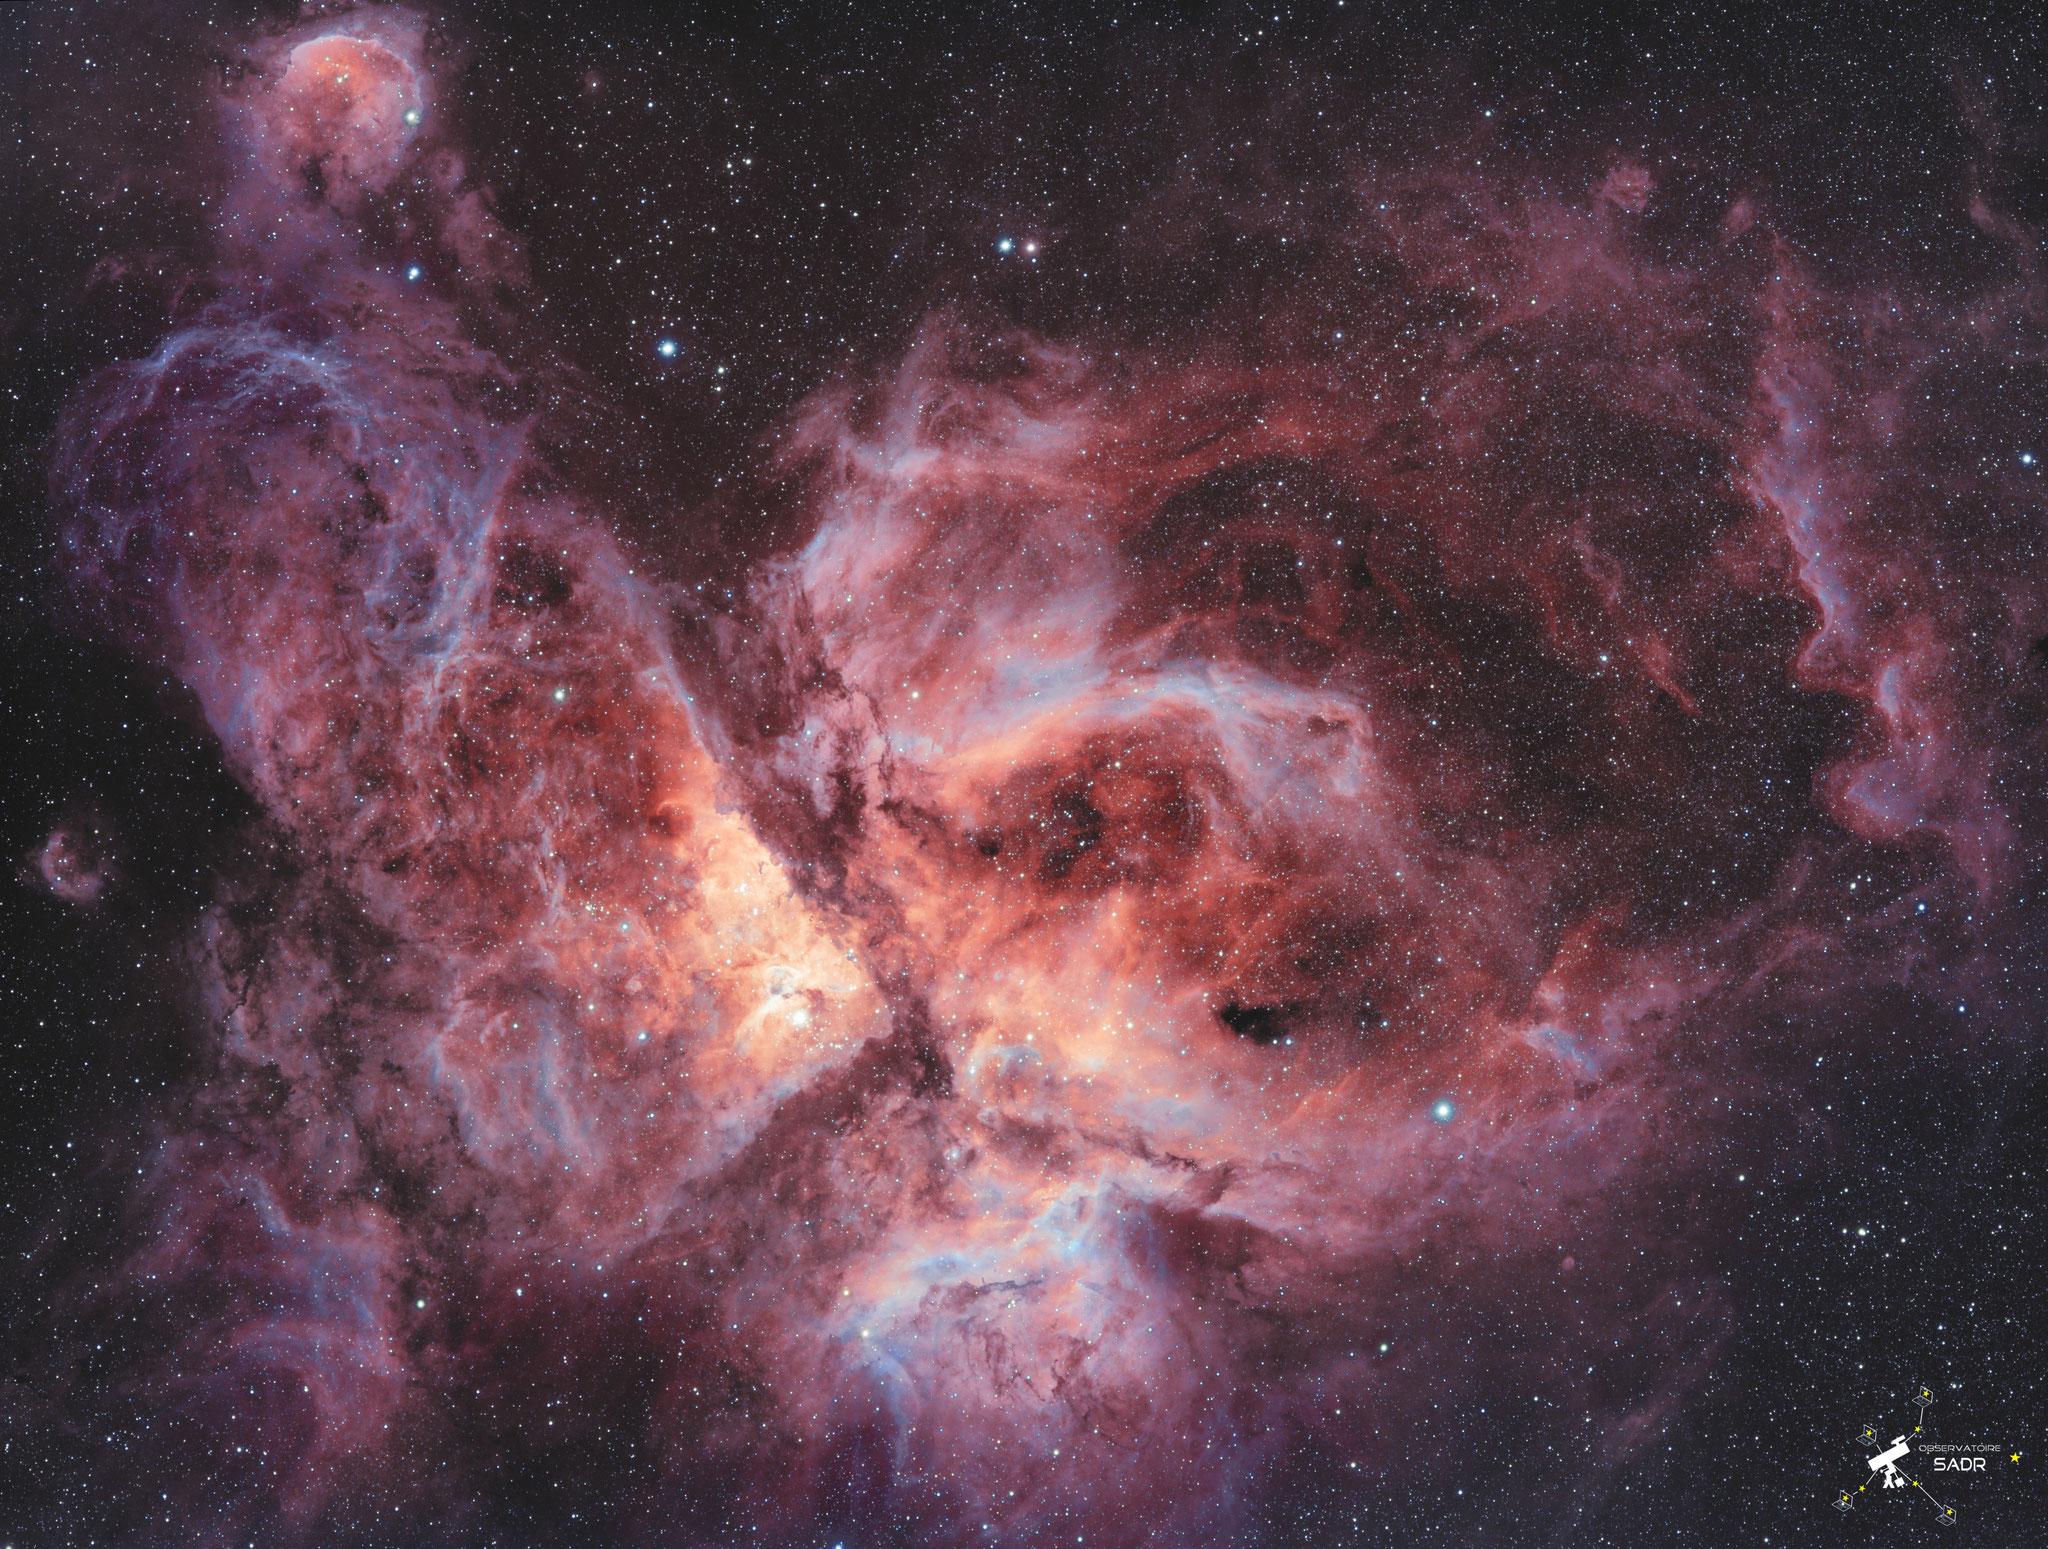 NGC 3372, SHO, lunette 71, Nicolas